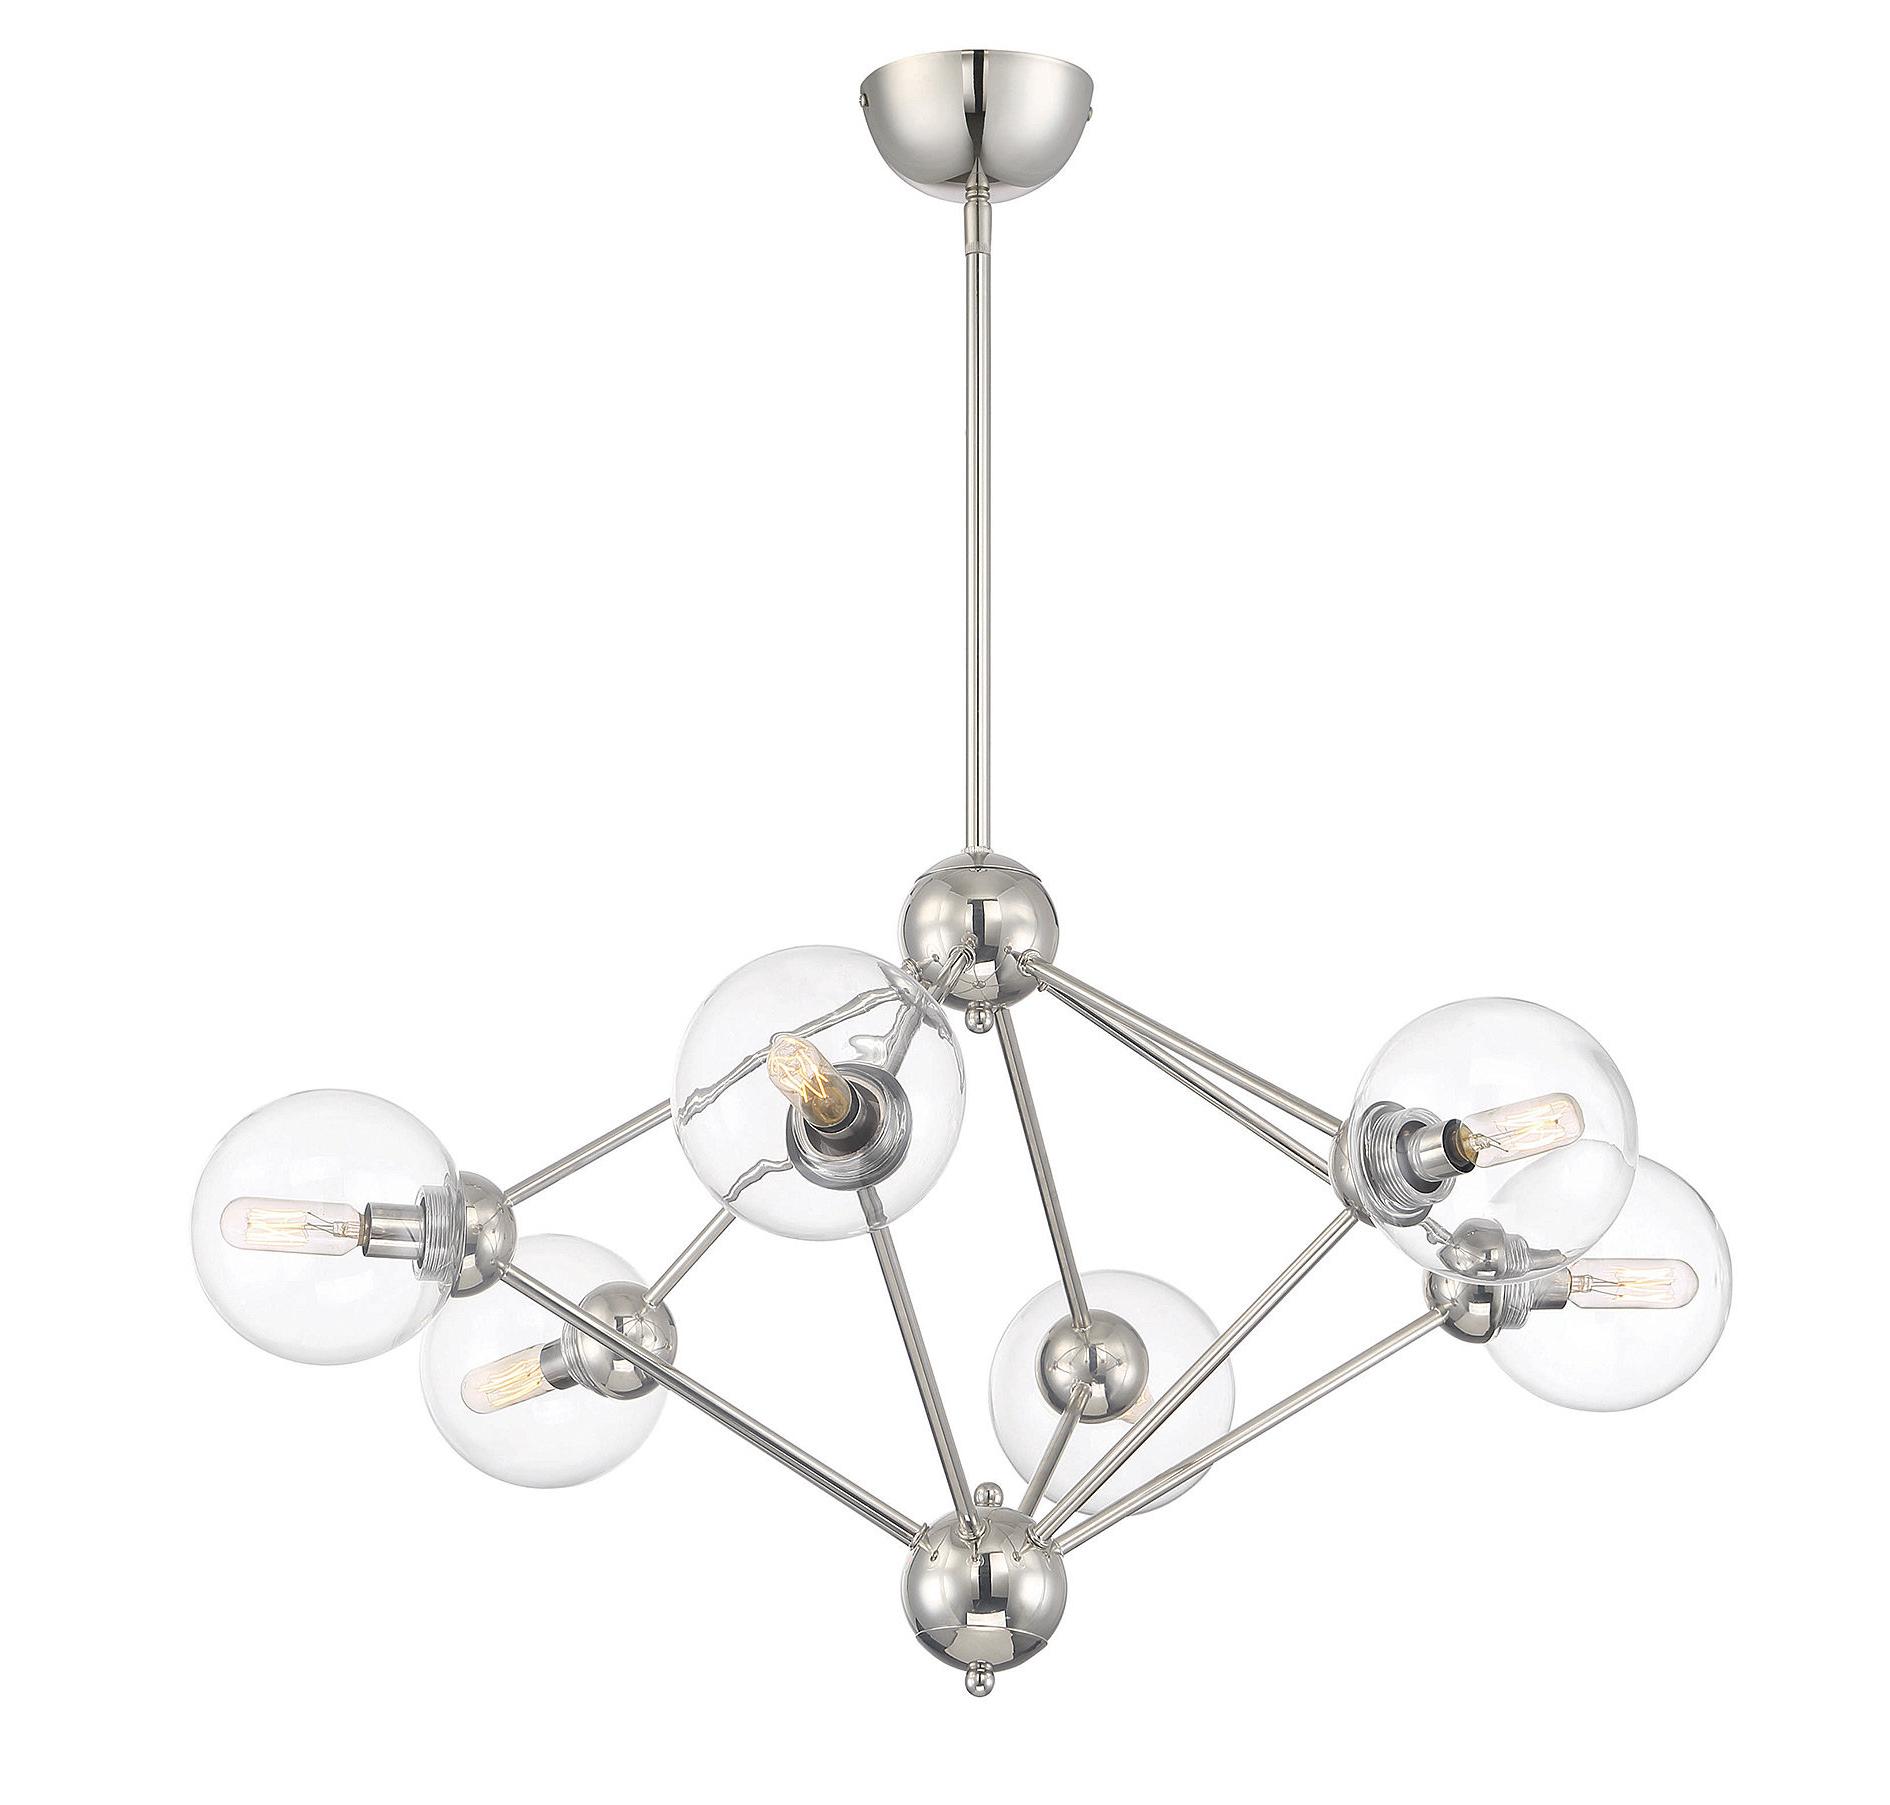 Well Known Johanne 6 Light Sputnik Chandeliers With Regard To Valetta 6 Light Geometric Chandelier (View 7 of 20)